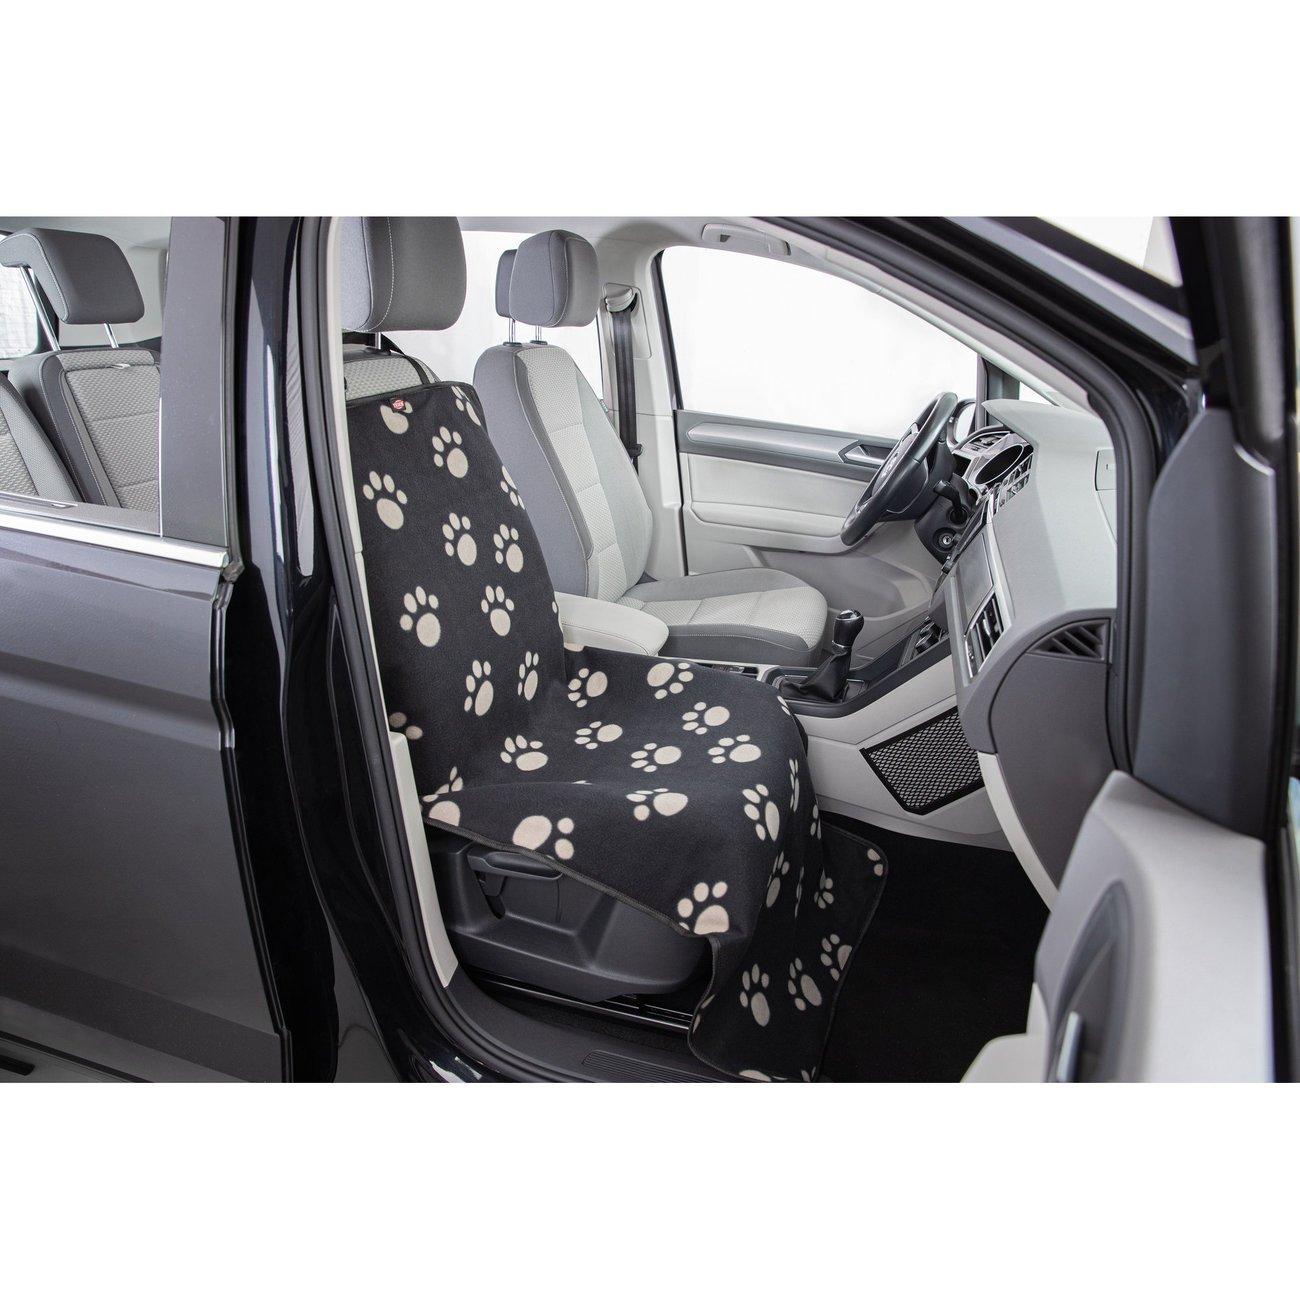 TRIXIE Hundedecke Autositz Pfotenmotiv 13235, Bild 6